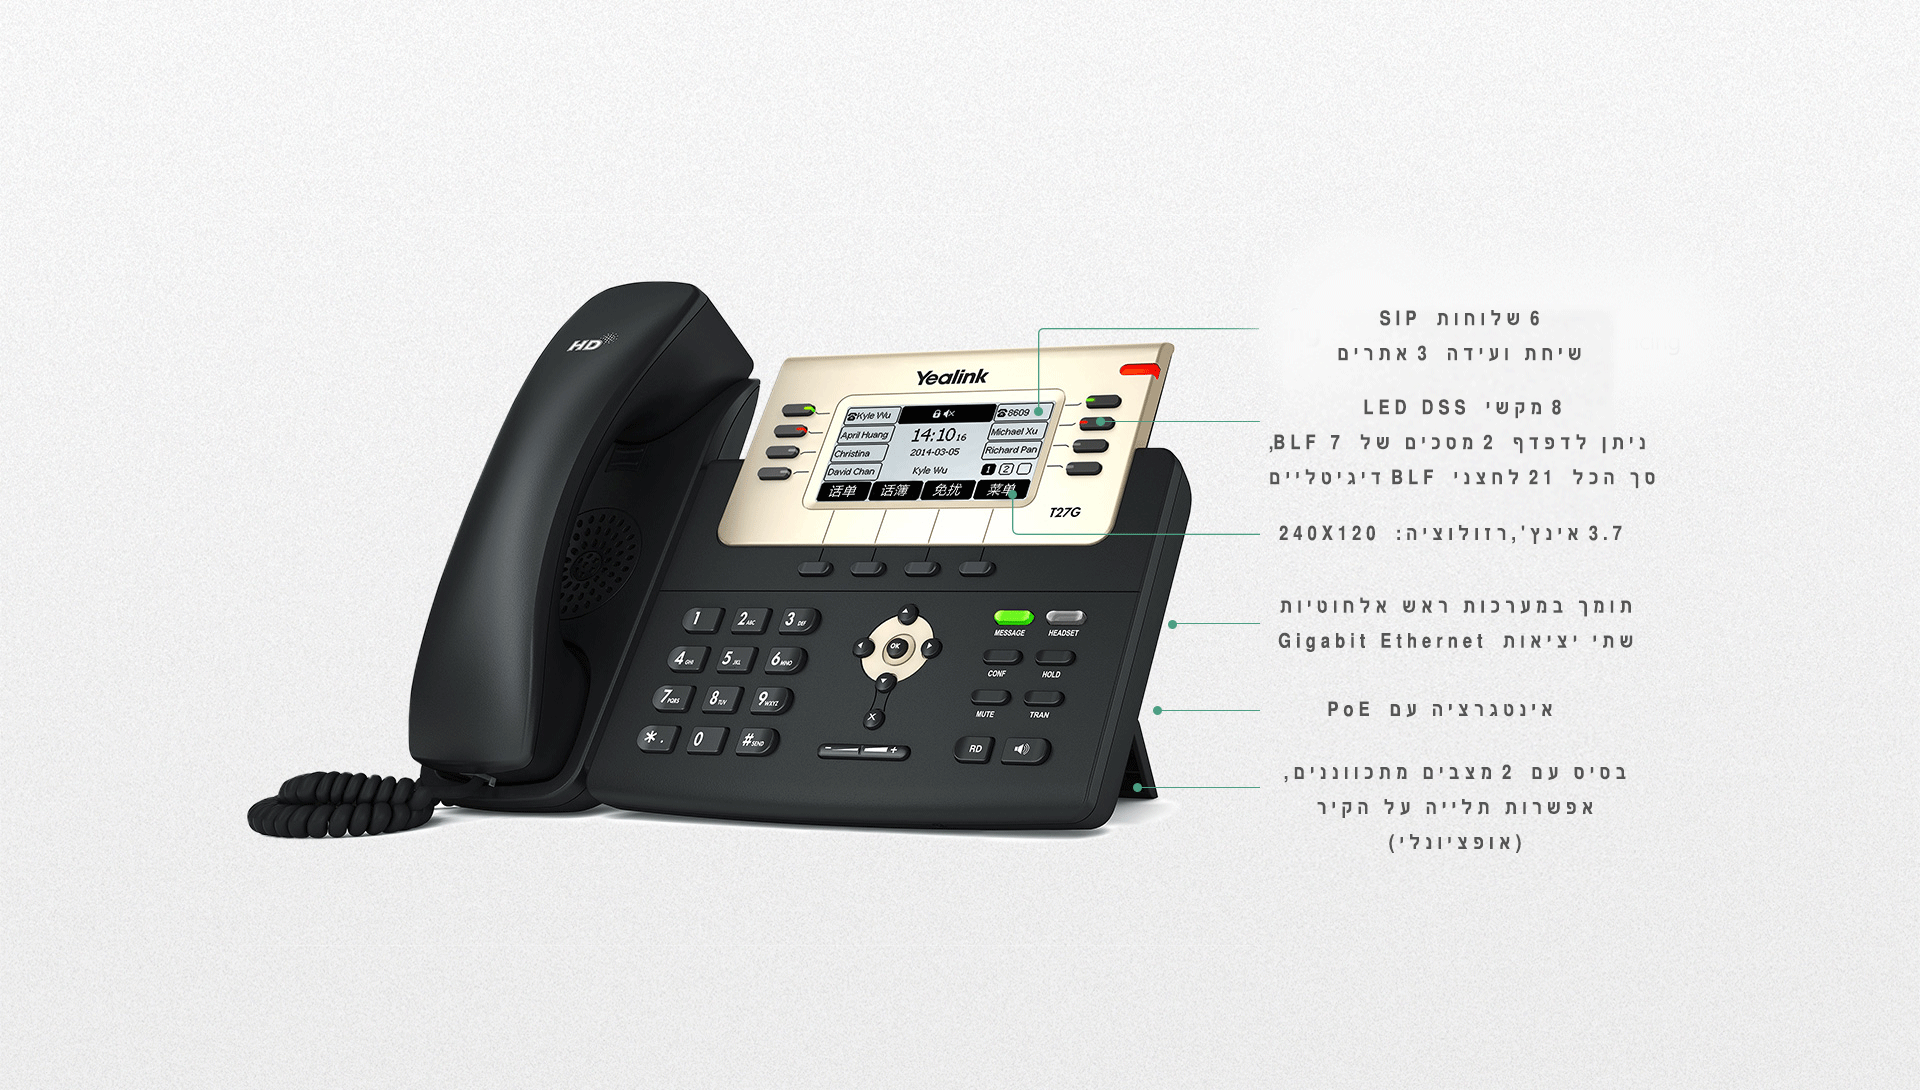 T27G טלפון IP לעסקים yealink מקורי